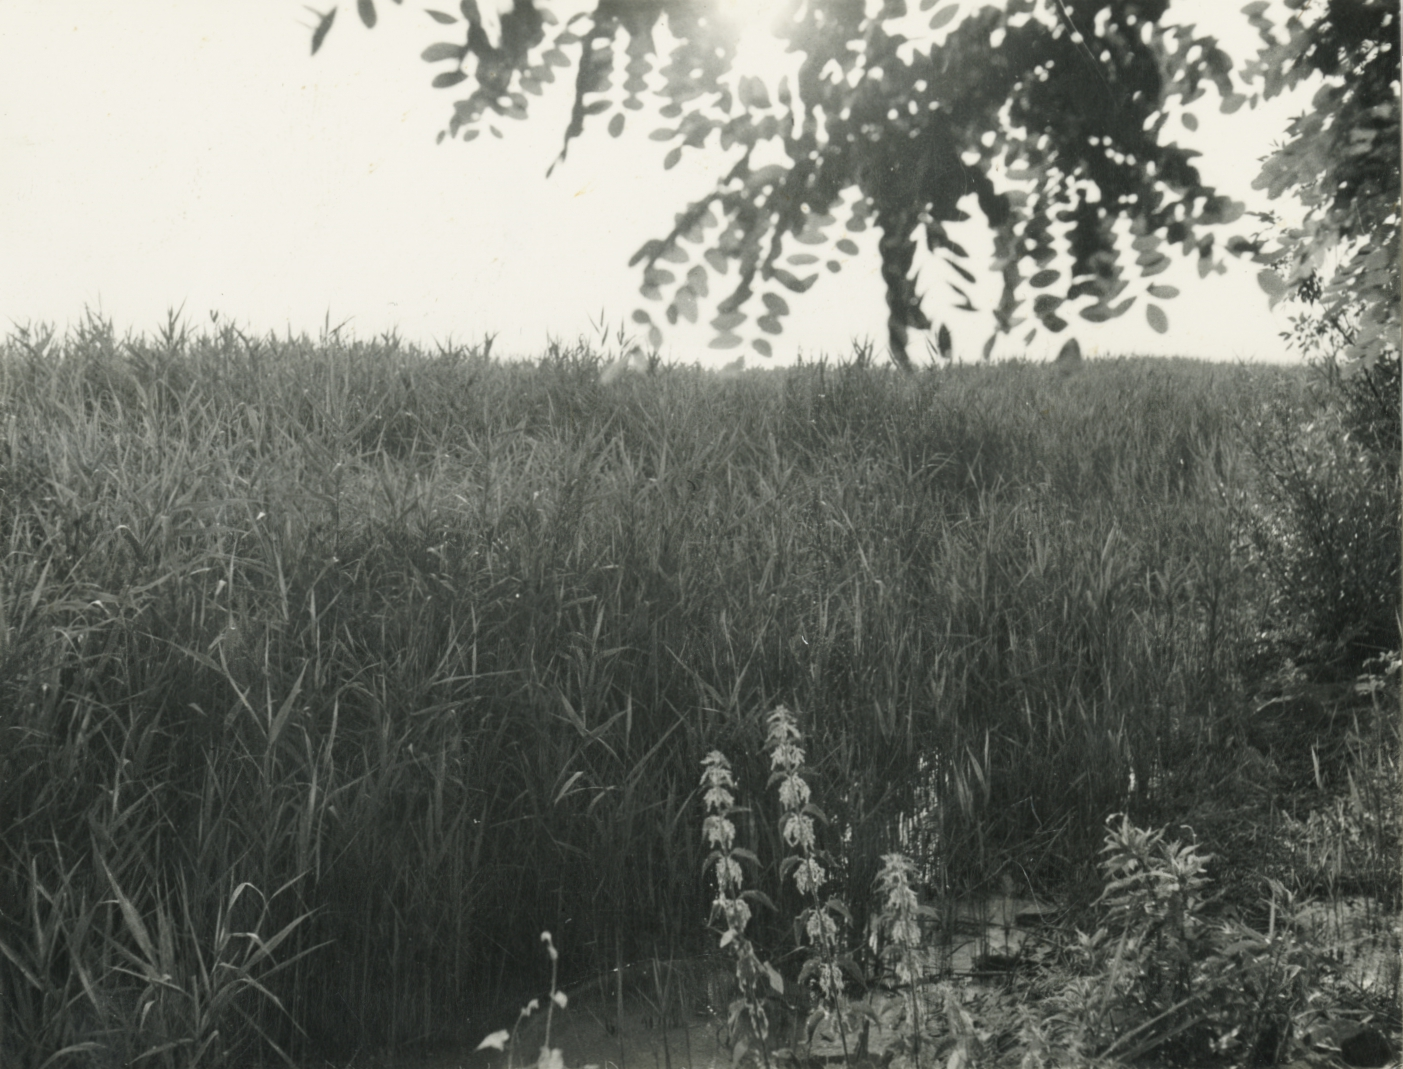 Balatonakarattyai tópart